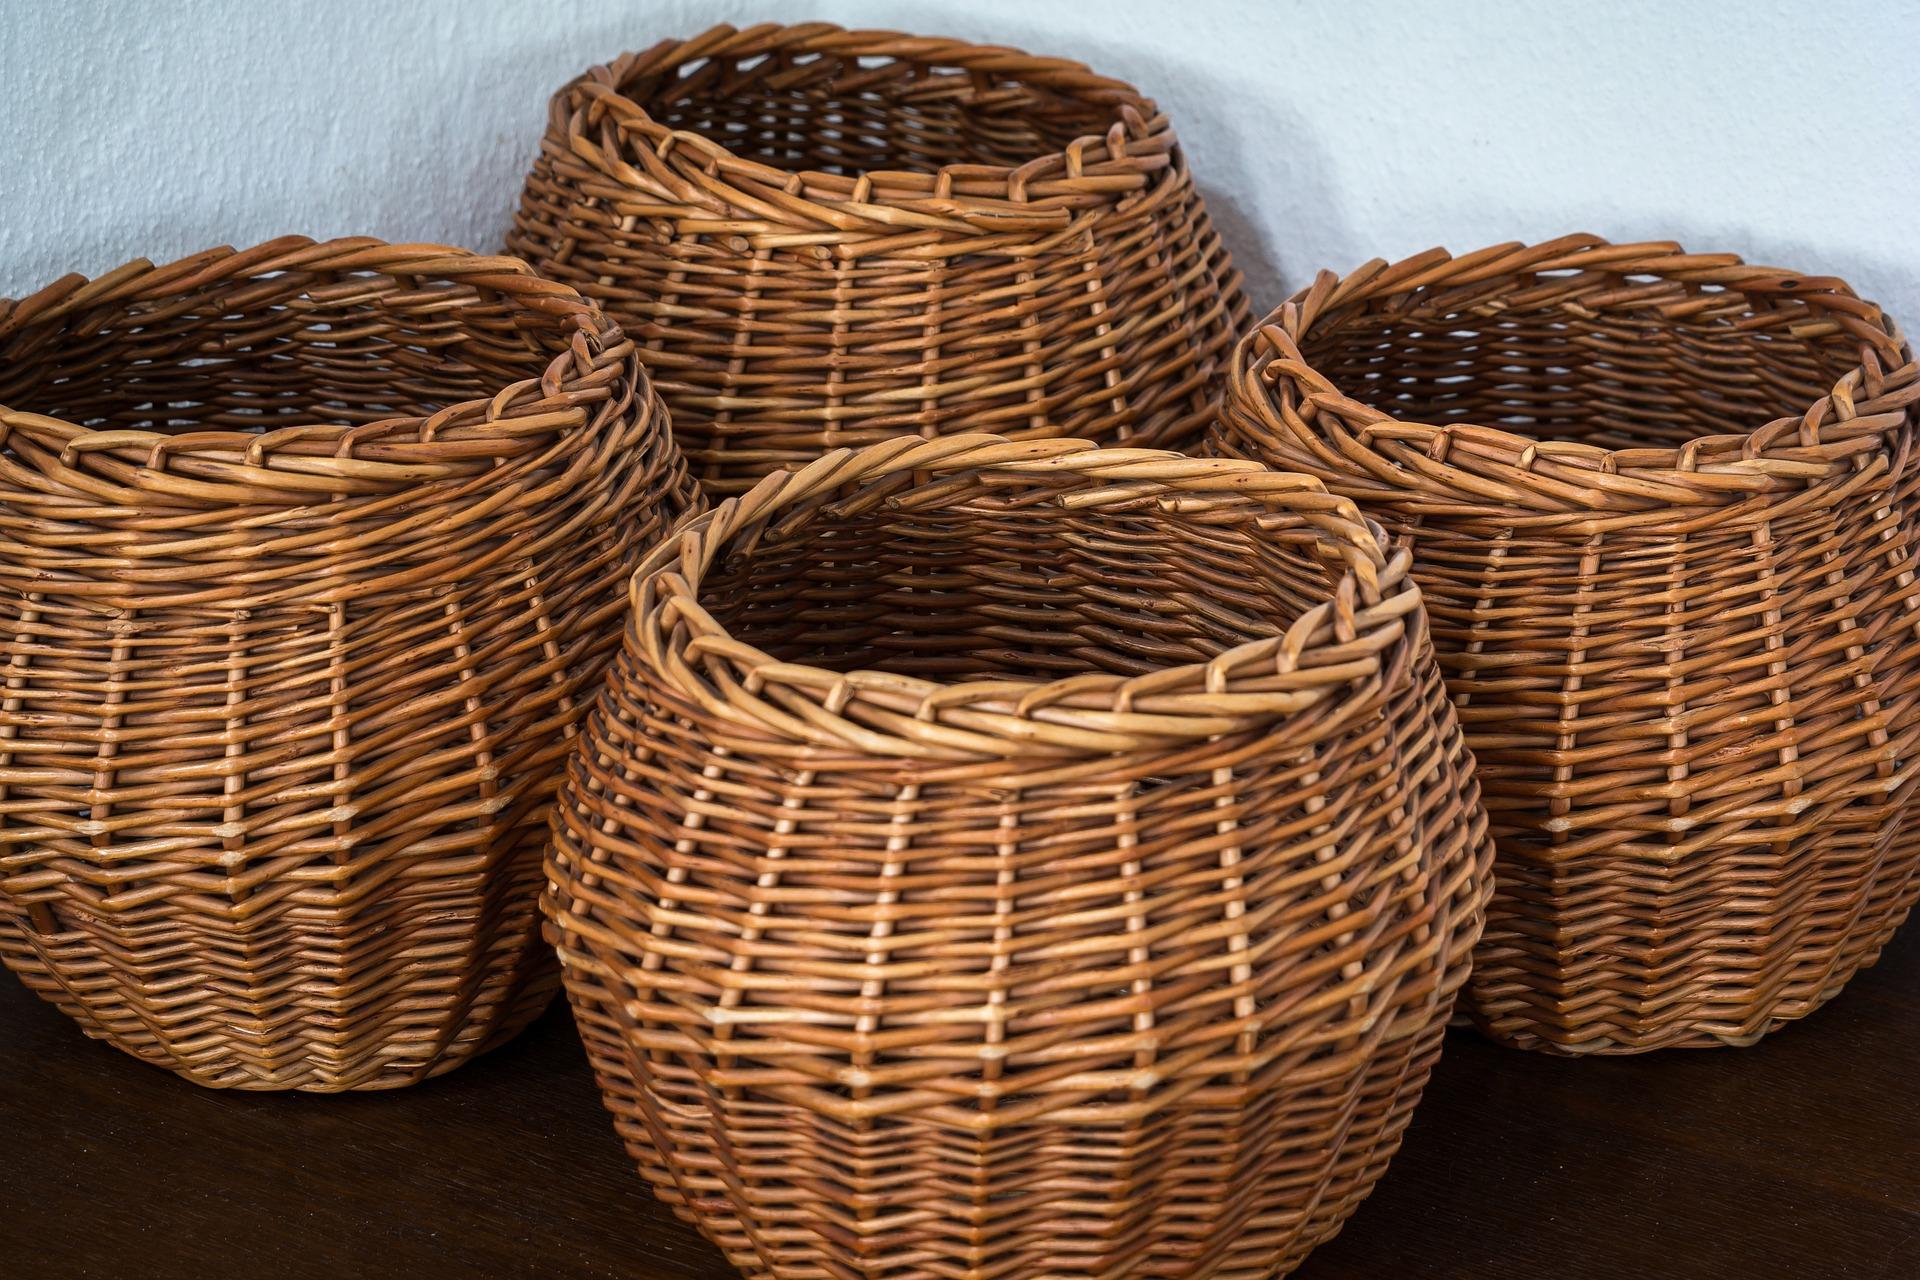 basket-1195754_1920.jpg